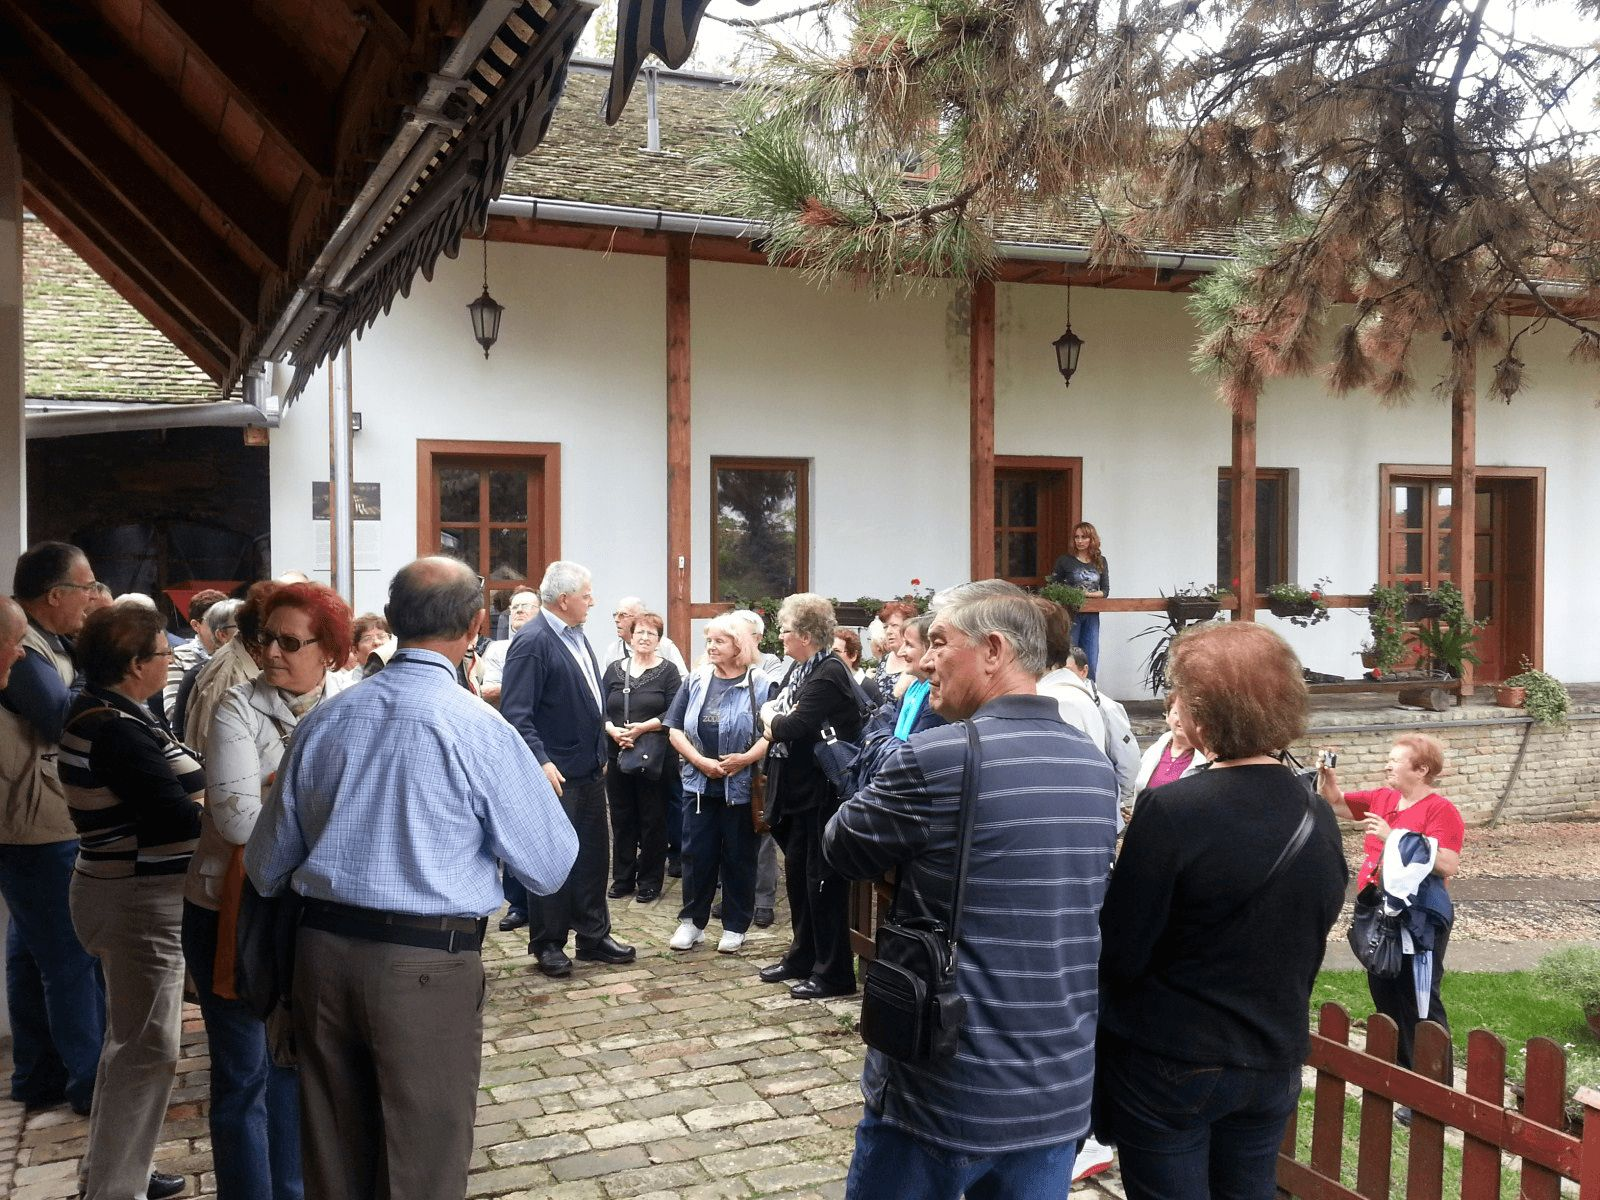 Beograd i Vojvodina: Sremski Karlovci: Muzej meda i vinarija Živanović